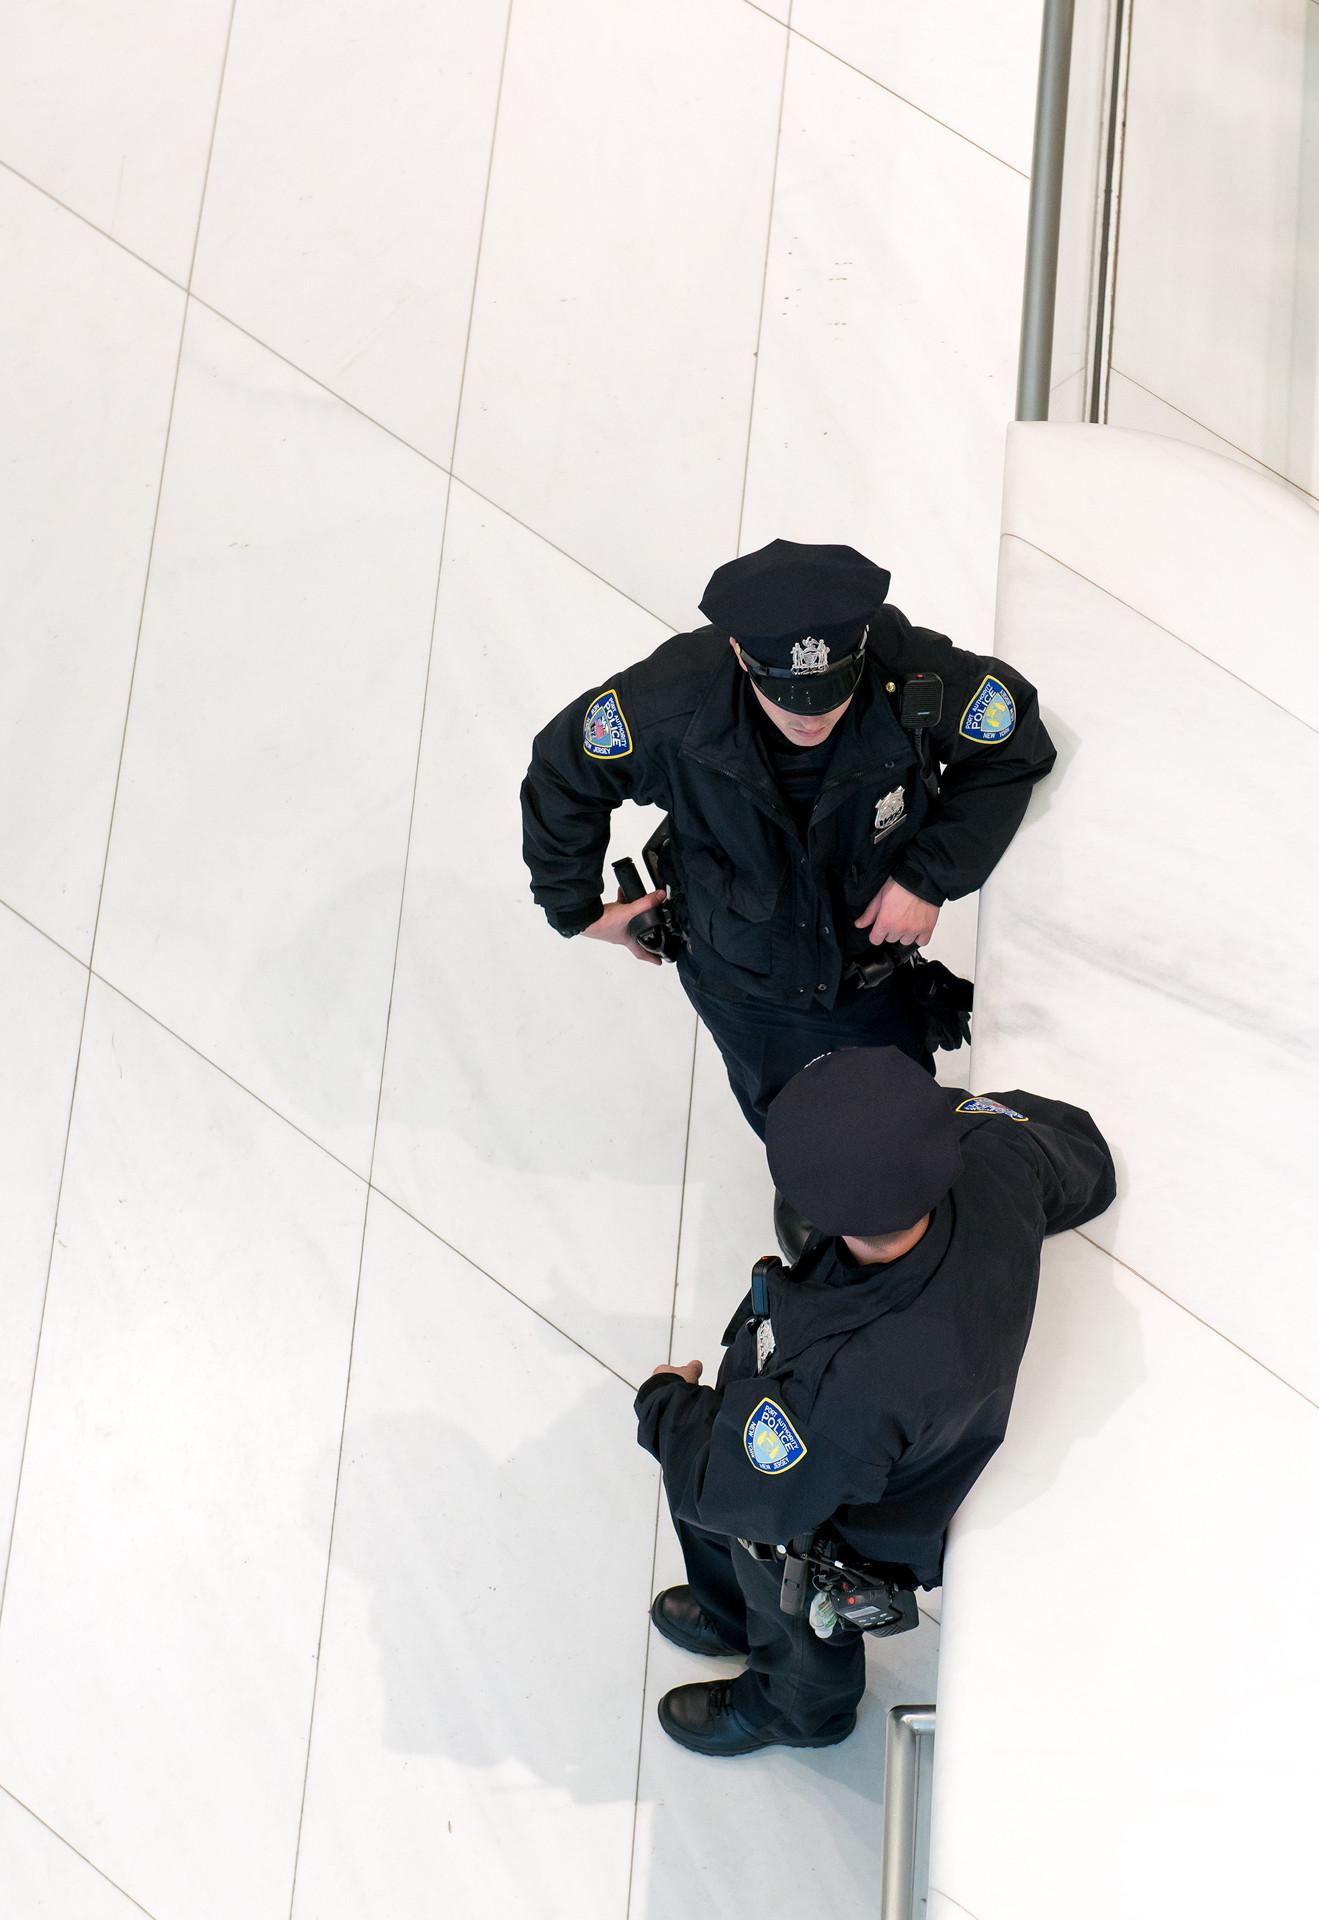 Two cops in Ground Zero